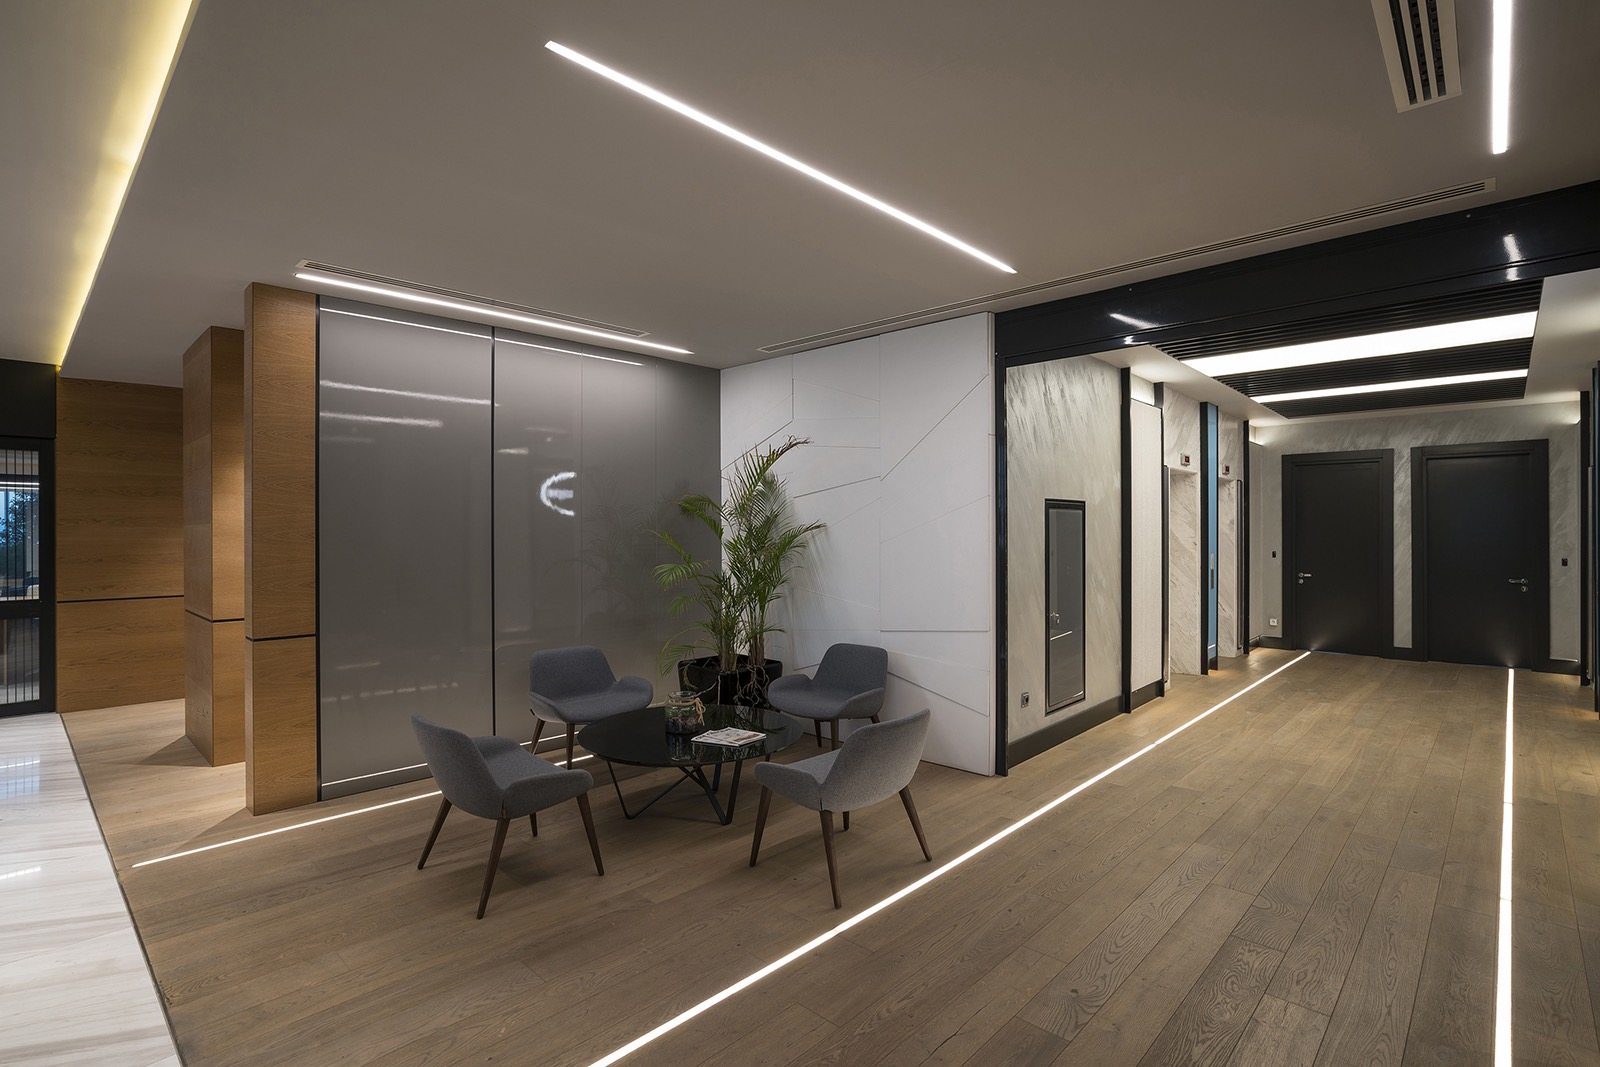 akyapi-istanbul-office-8